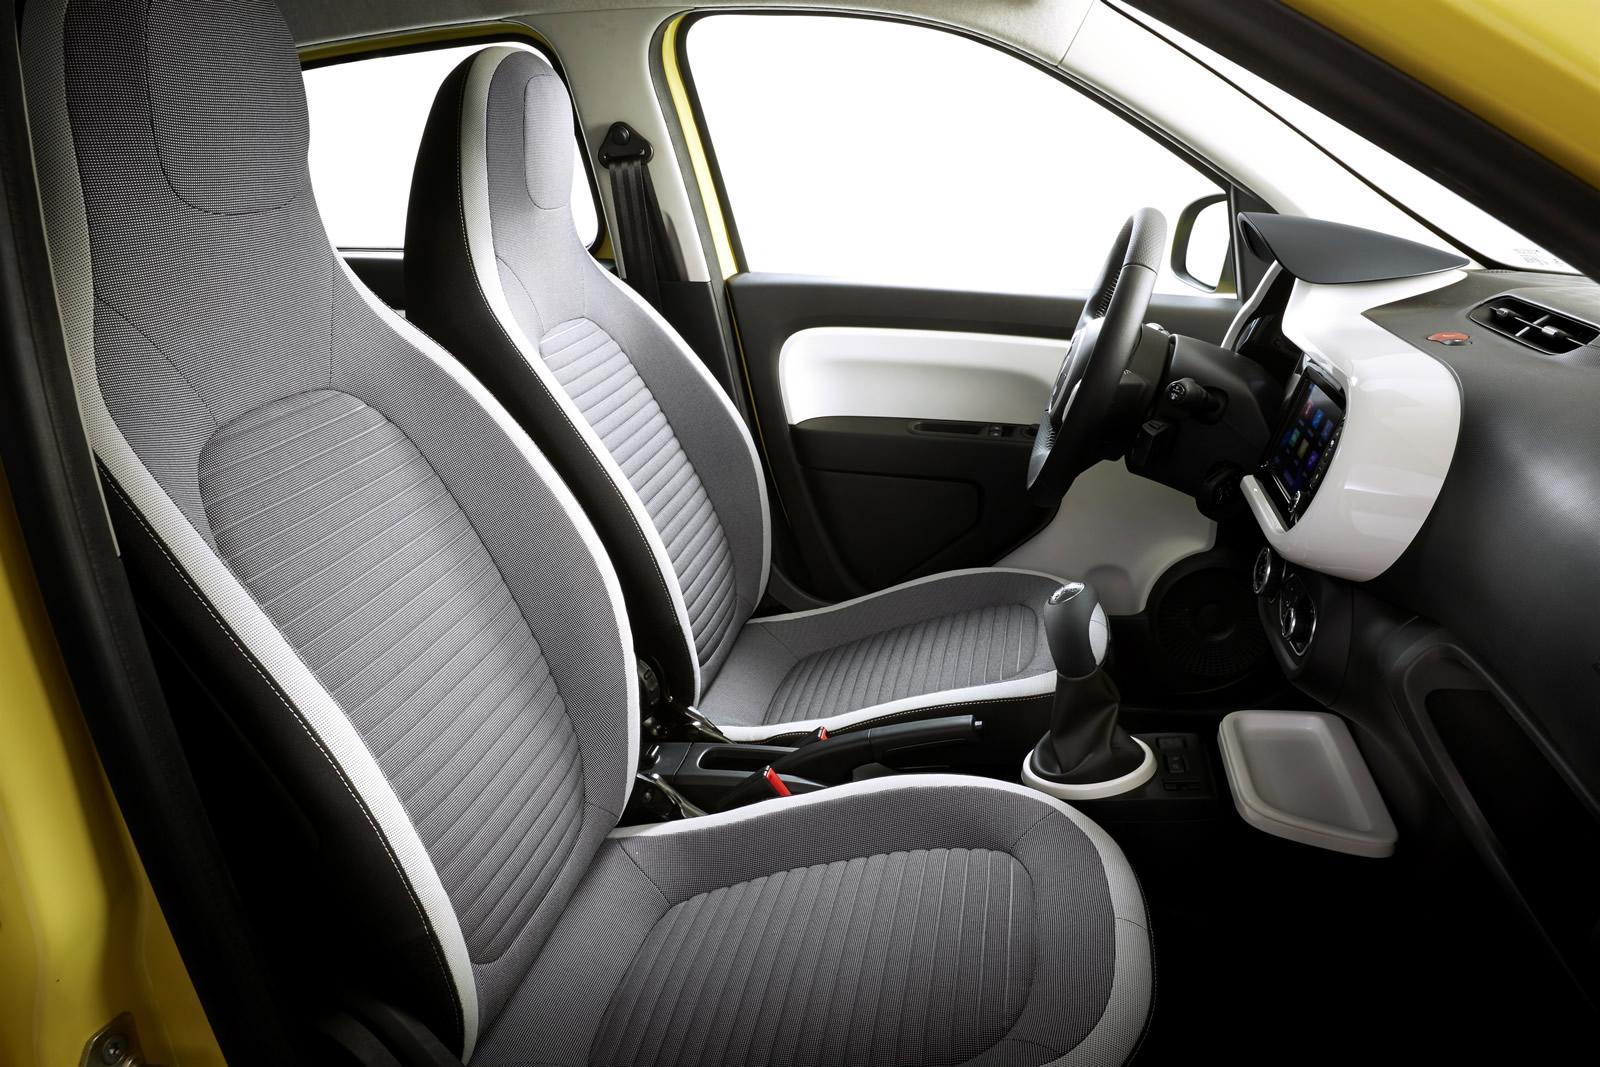 2015 Renault Twingo Front Seats Interior